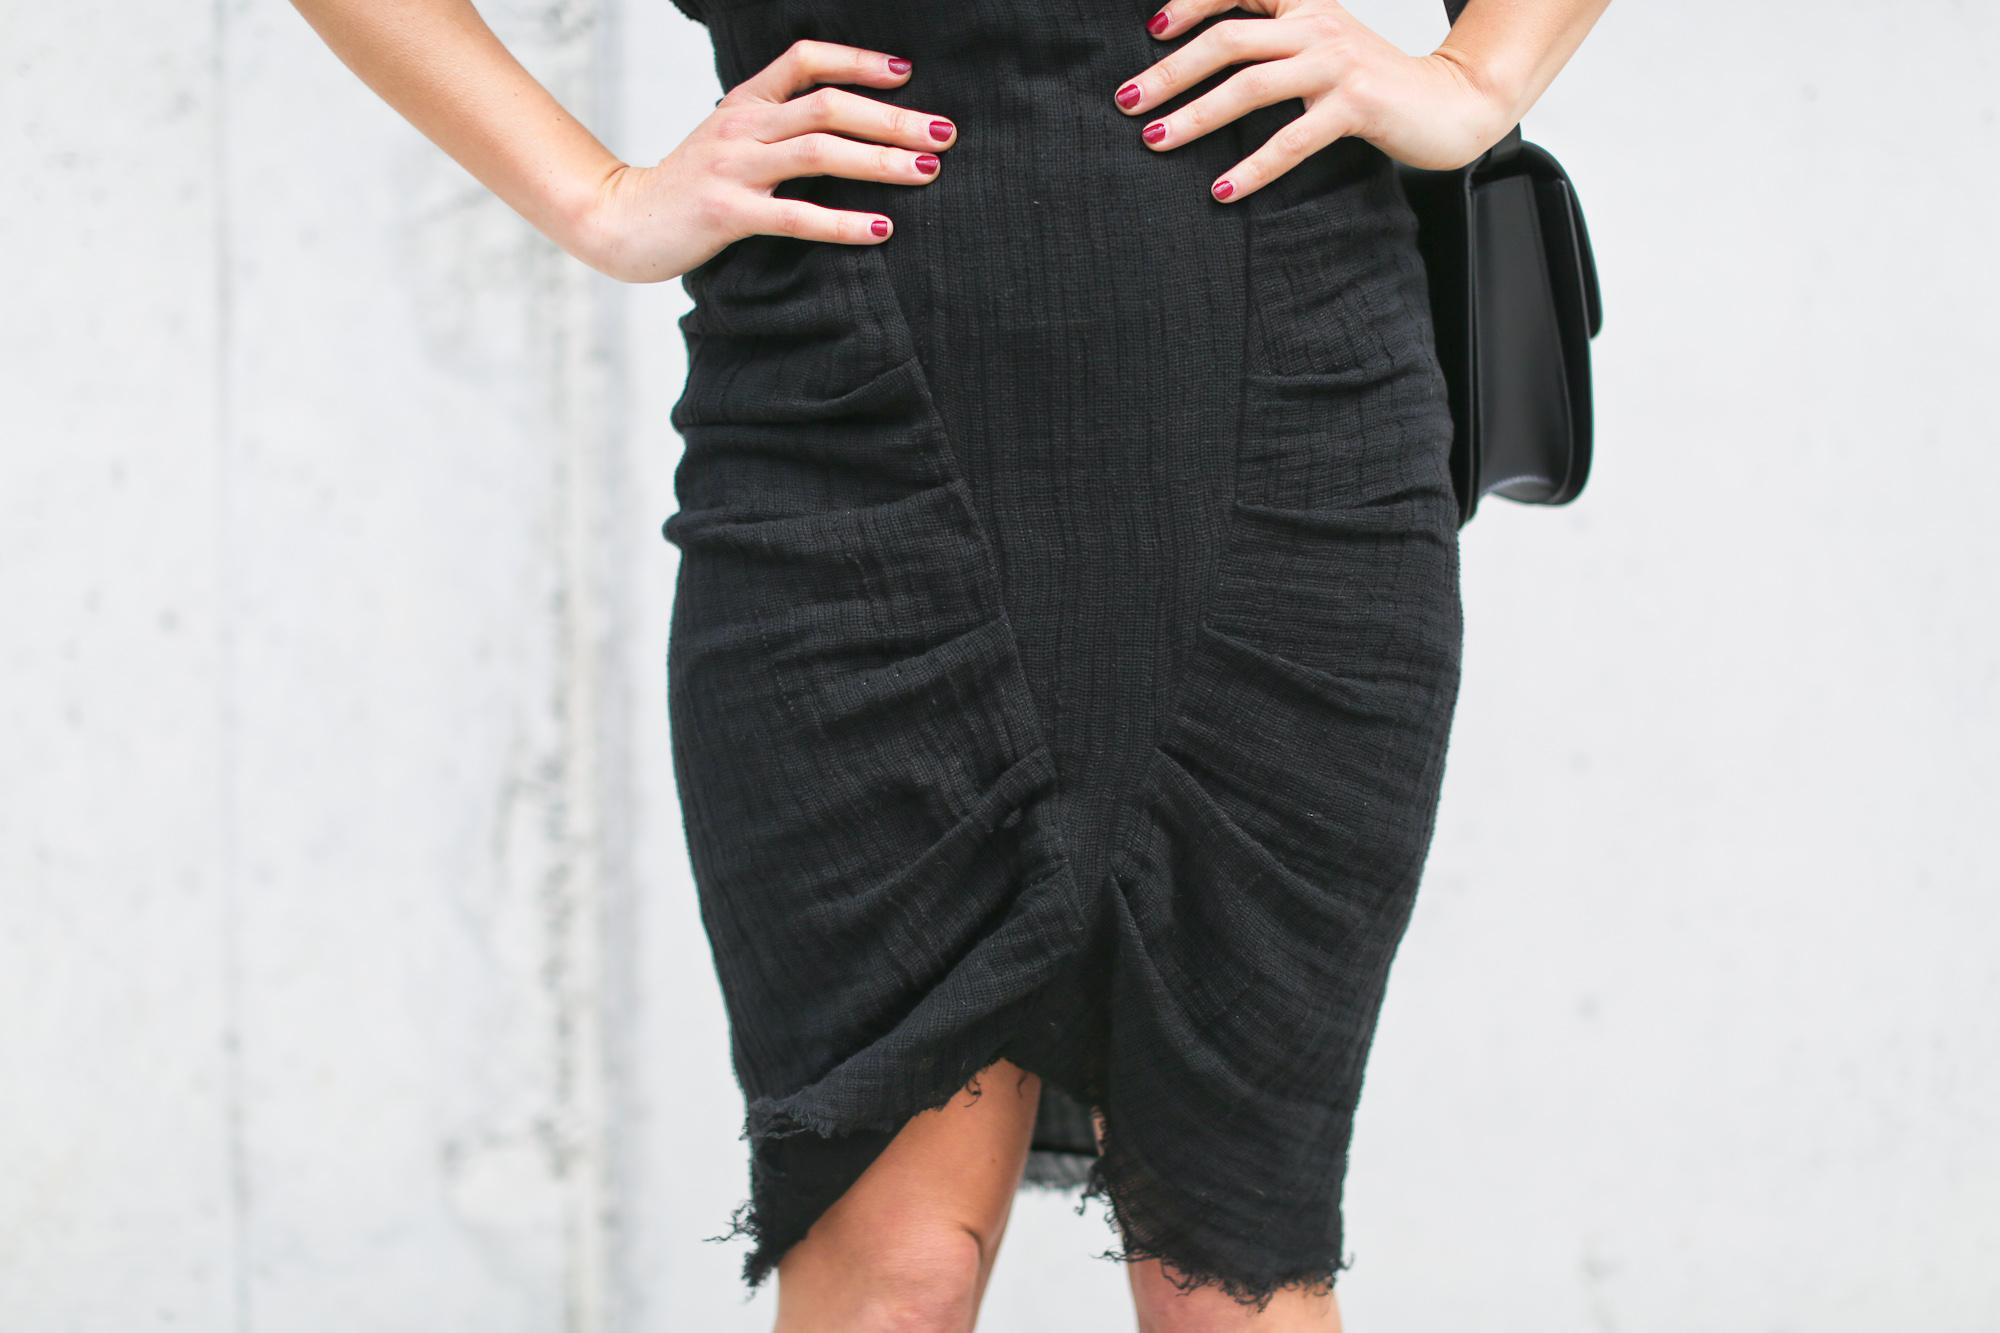 Clochet_streetstyle_masscob_villa_linen_dress_trimmerbilbao_celineboxbag-6